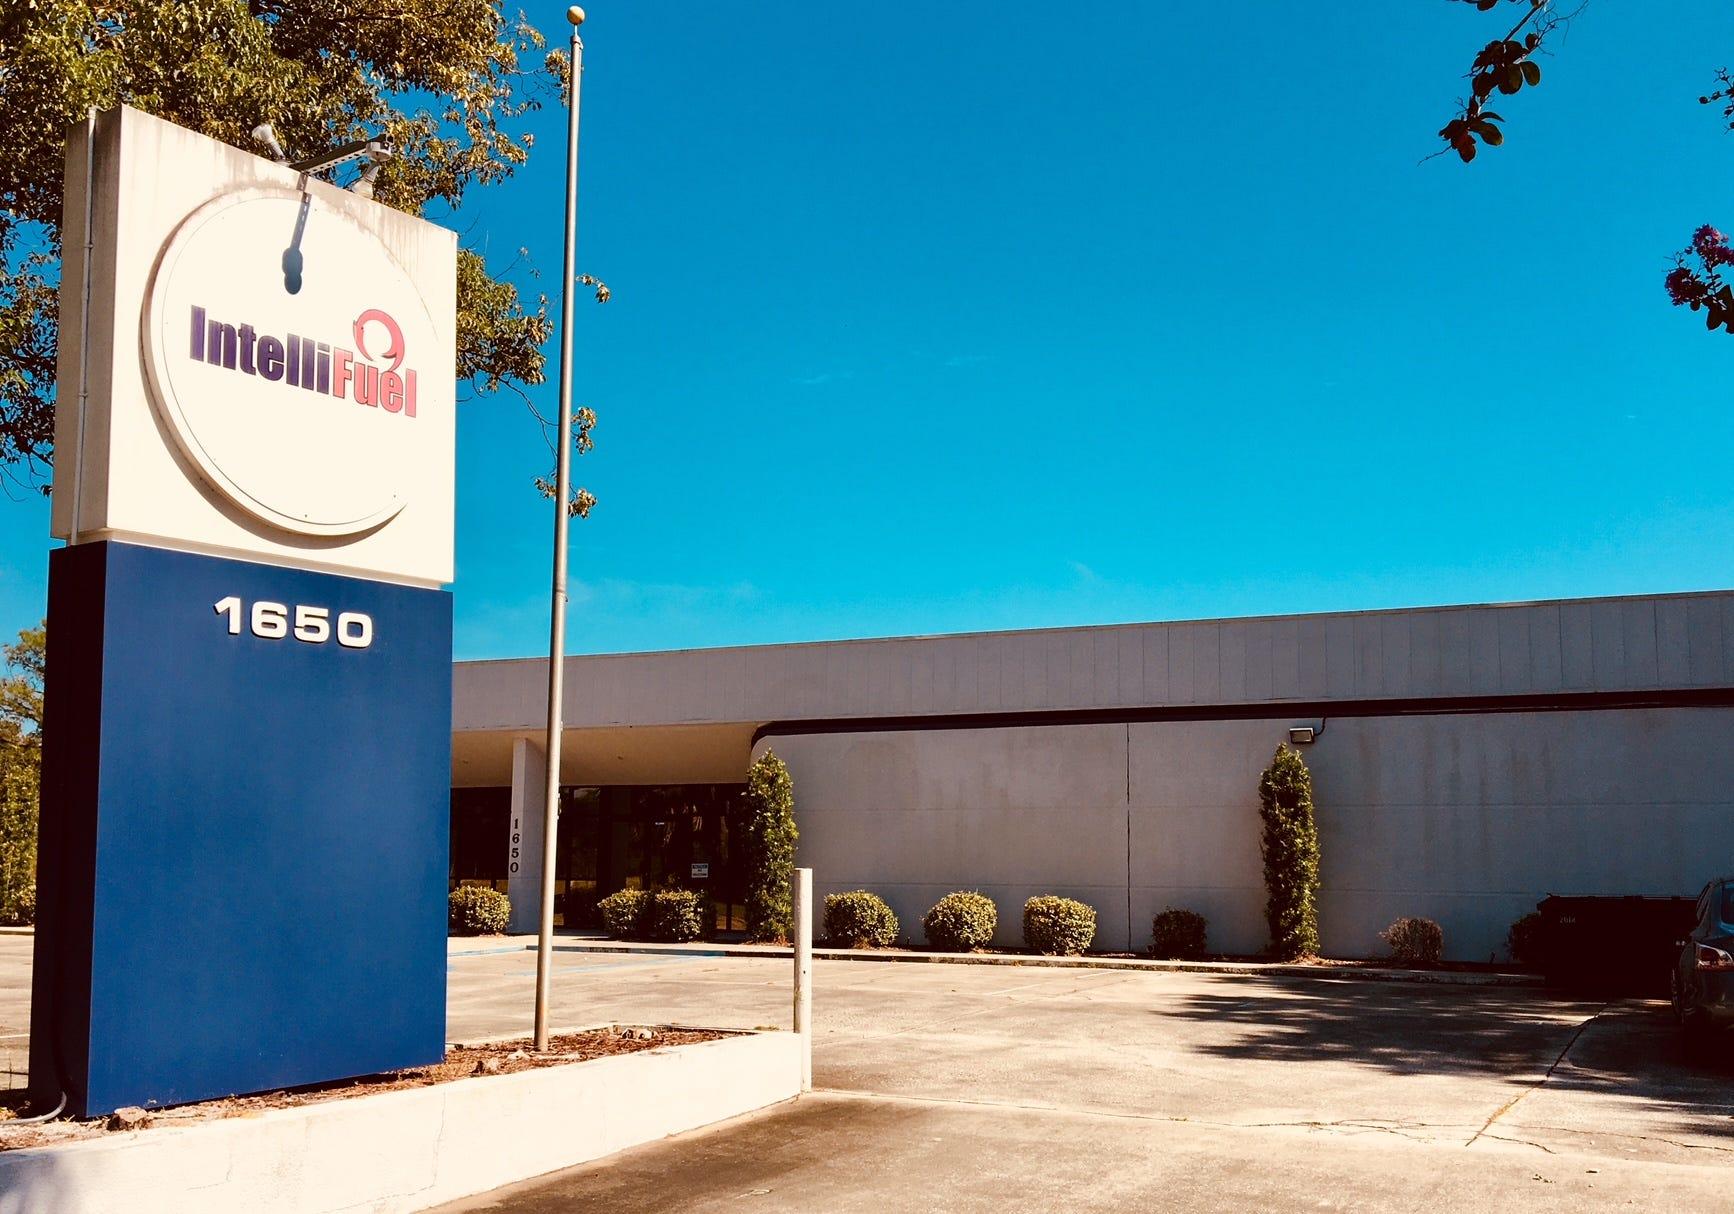 931c7bd8-b142-4647-ac24-b334505fd0e0-IntelliFuel Orlando aircraft maintenance company looks to move to Titusville, bringing 50 jobs